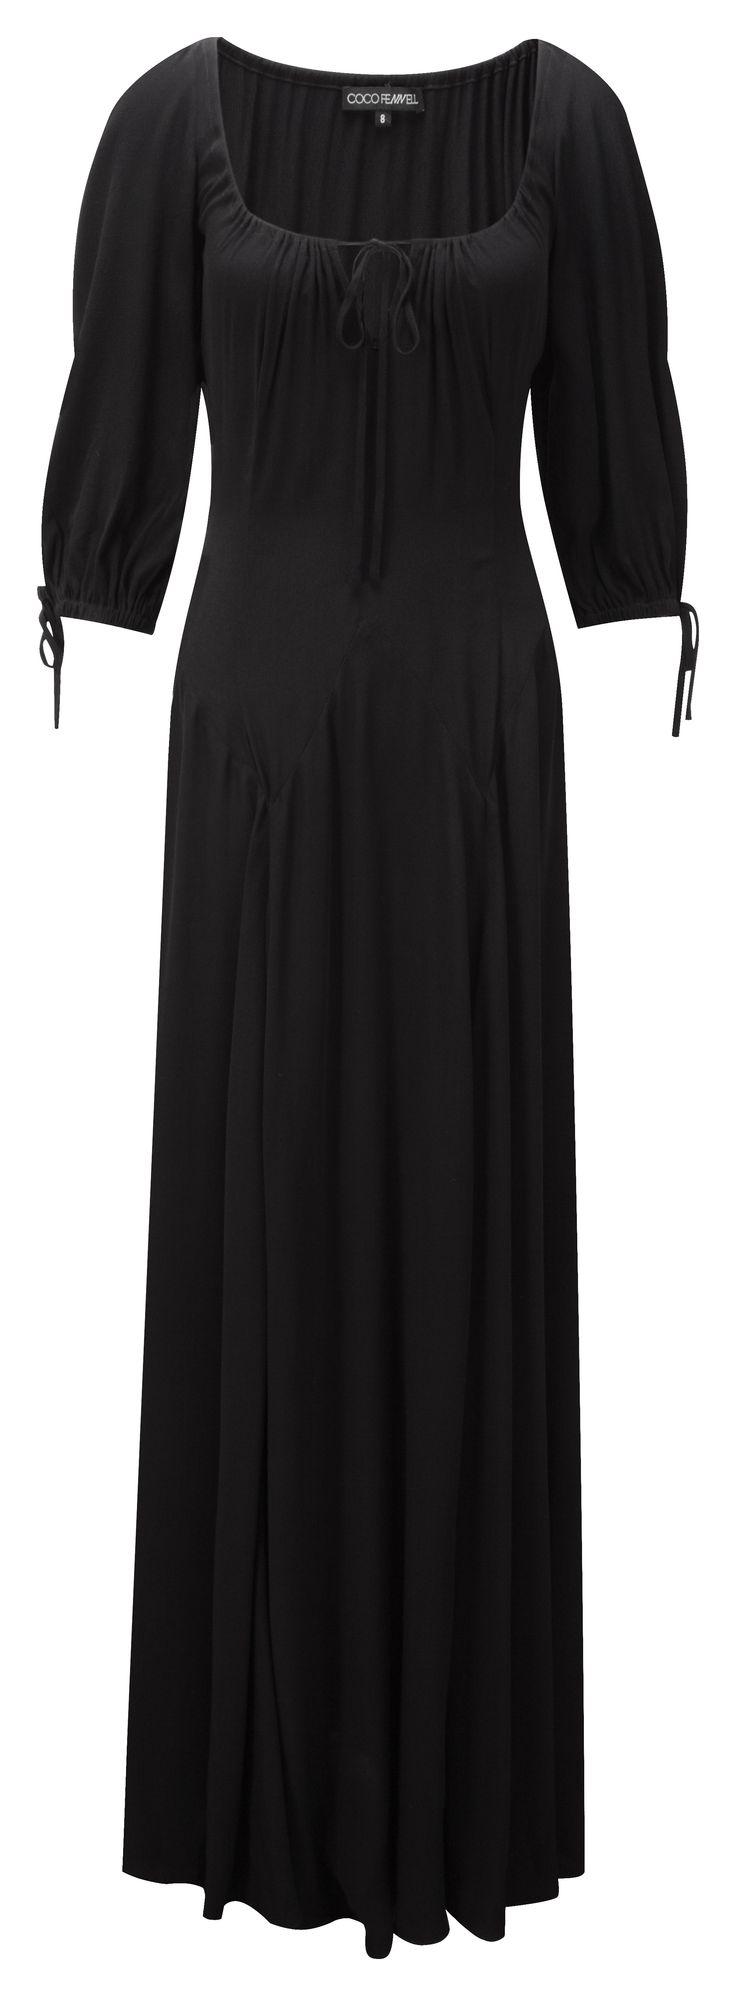 3/4 sleeve black maxi dress